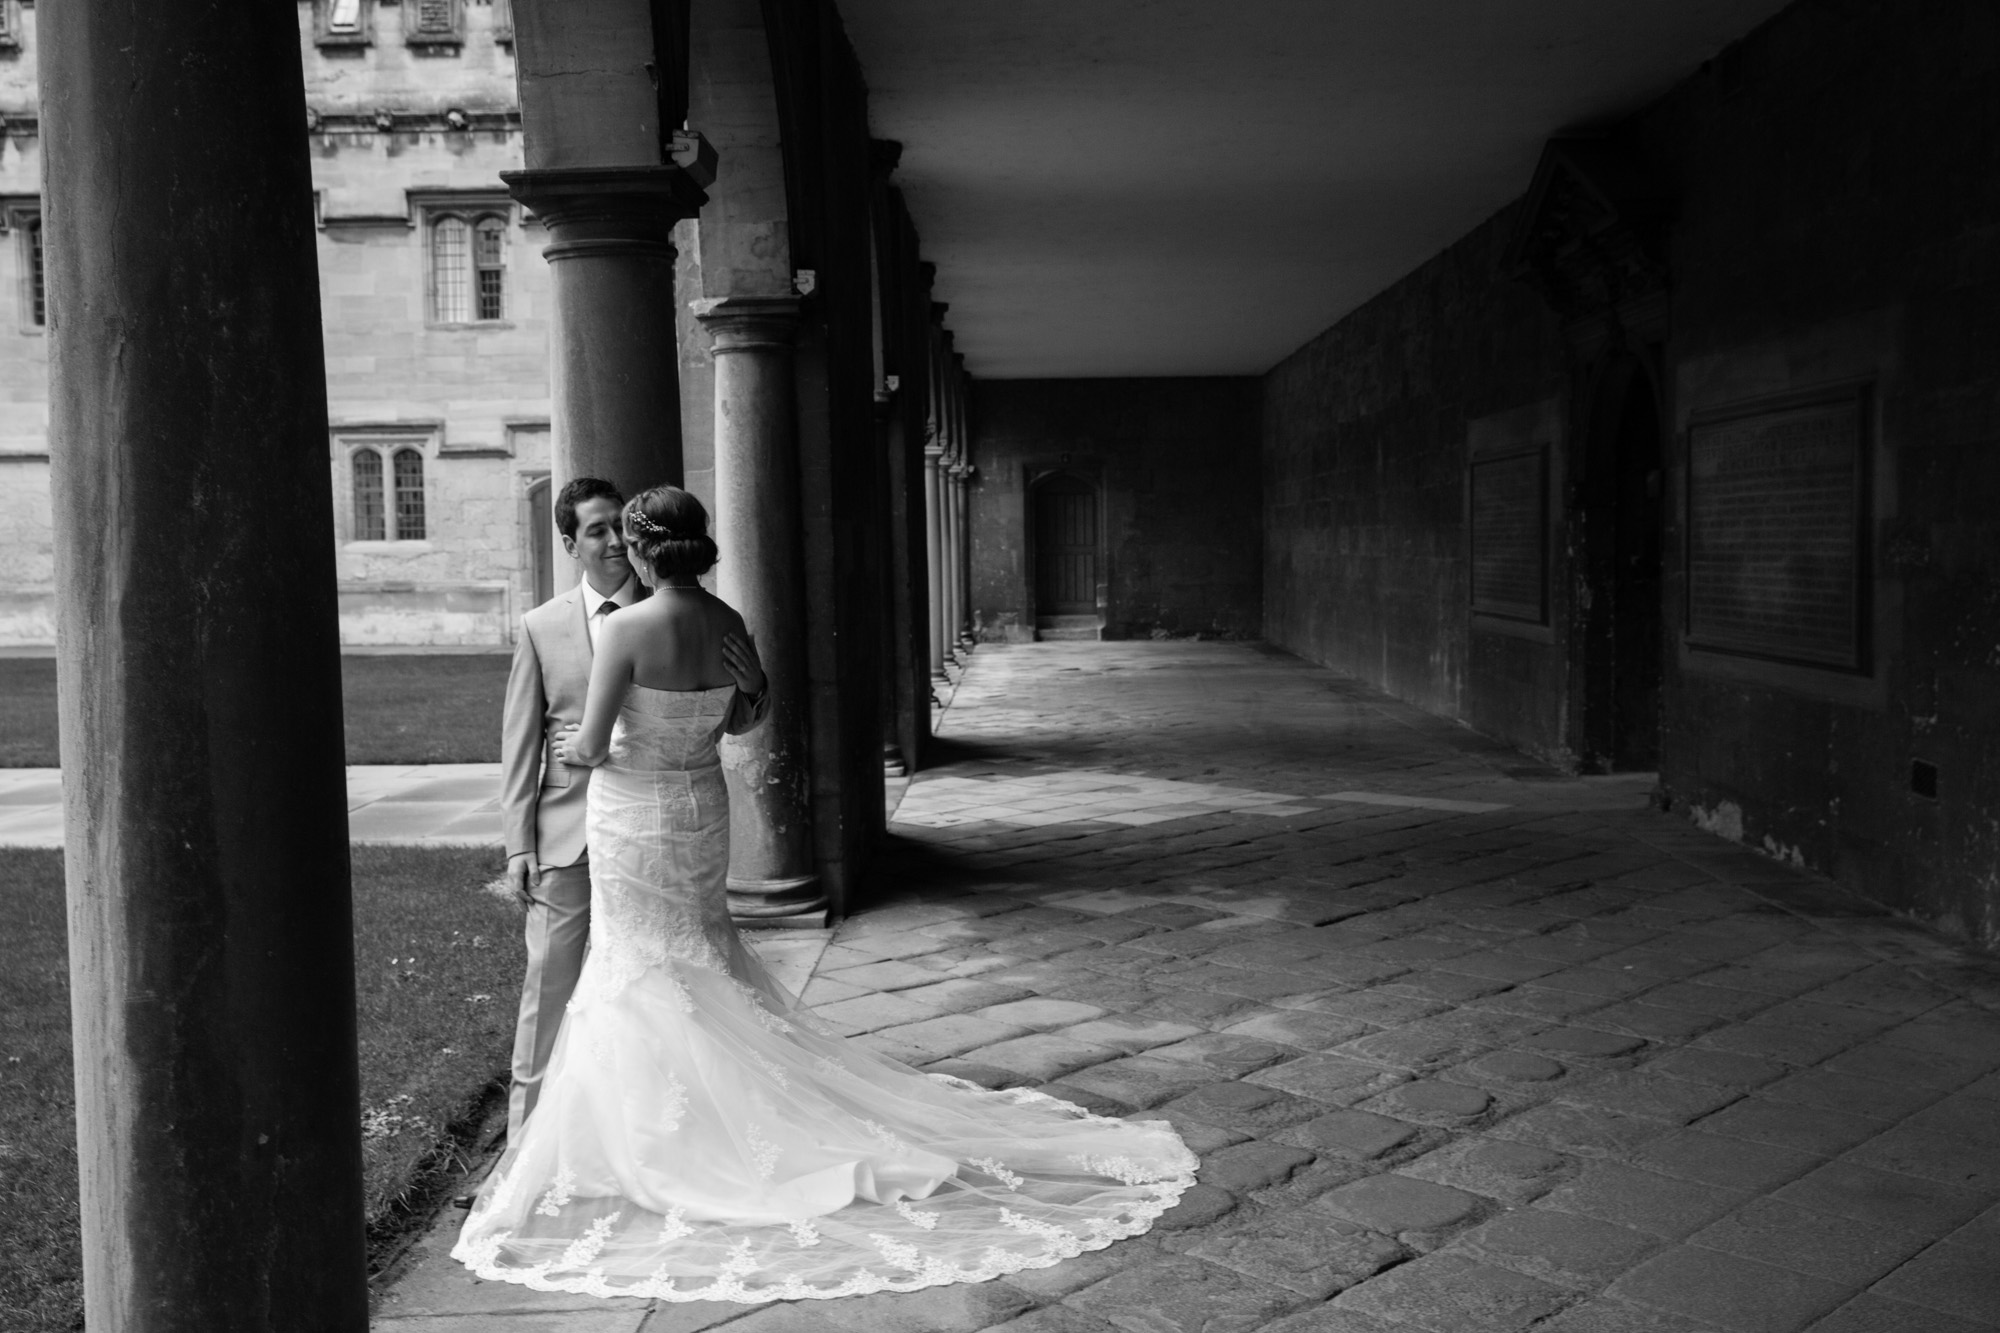 weddings-couples-love-photographer-oxford-london-jonathan-self-photography-66.jpg